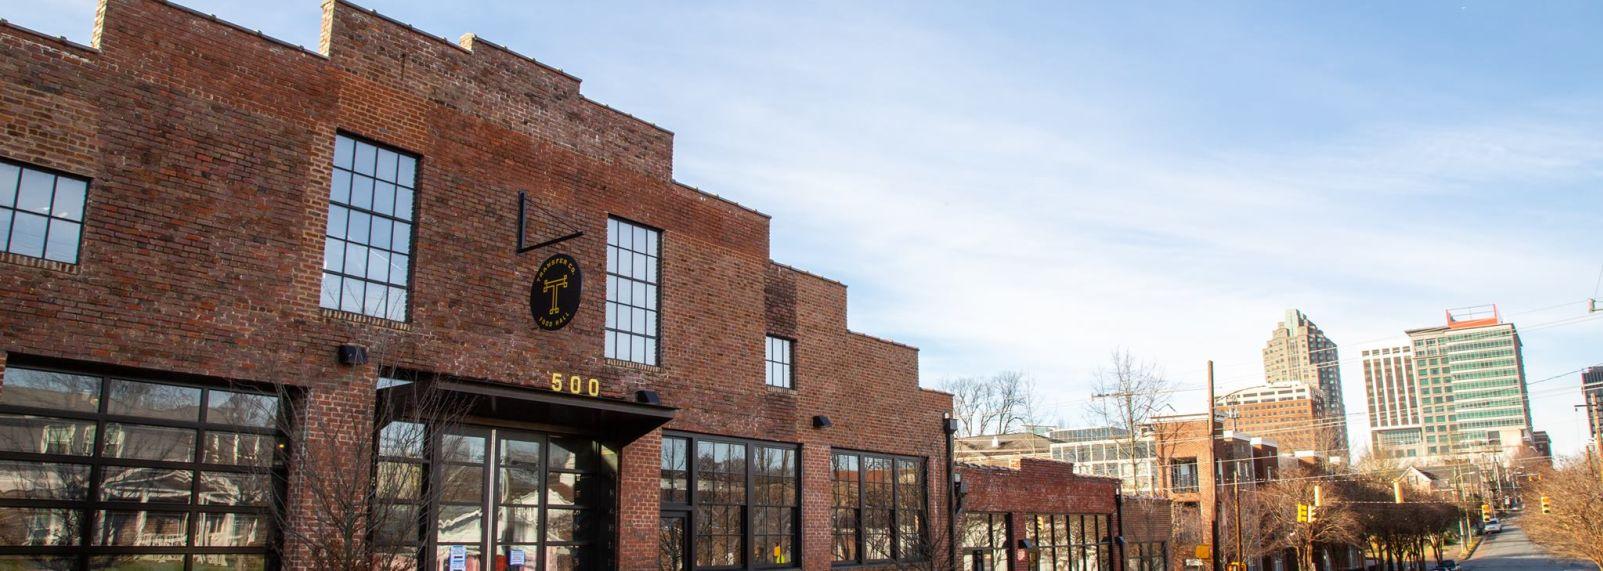 Transfer Co. Food Hall